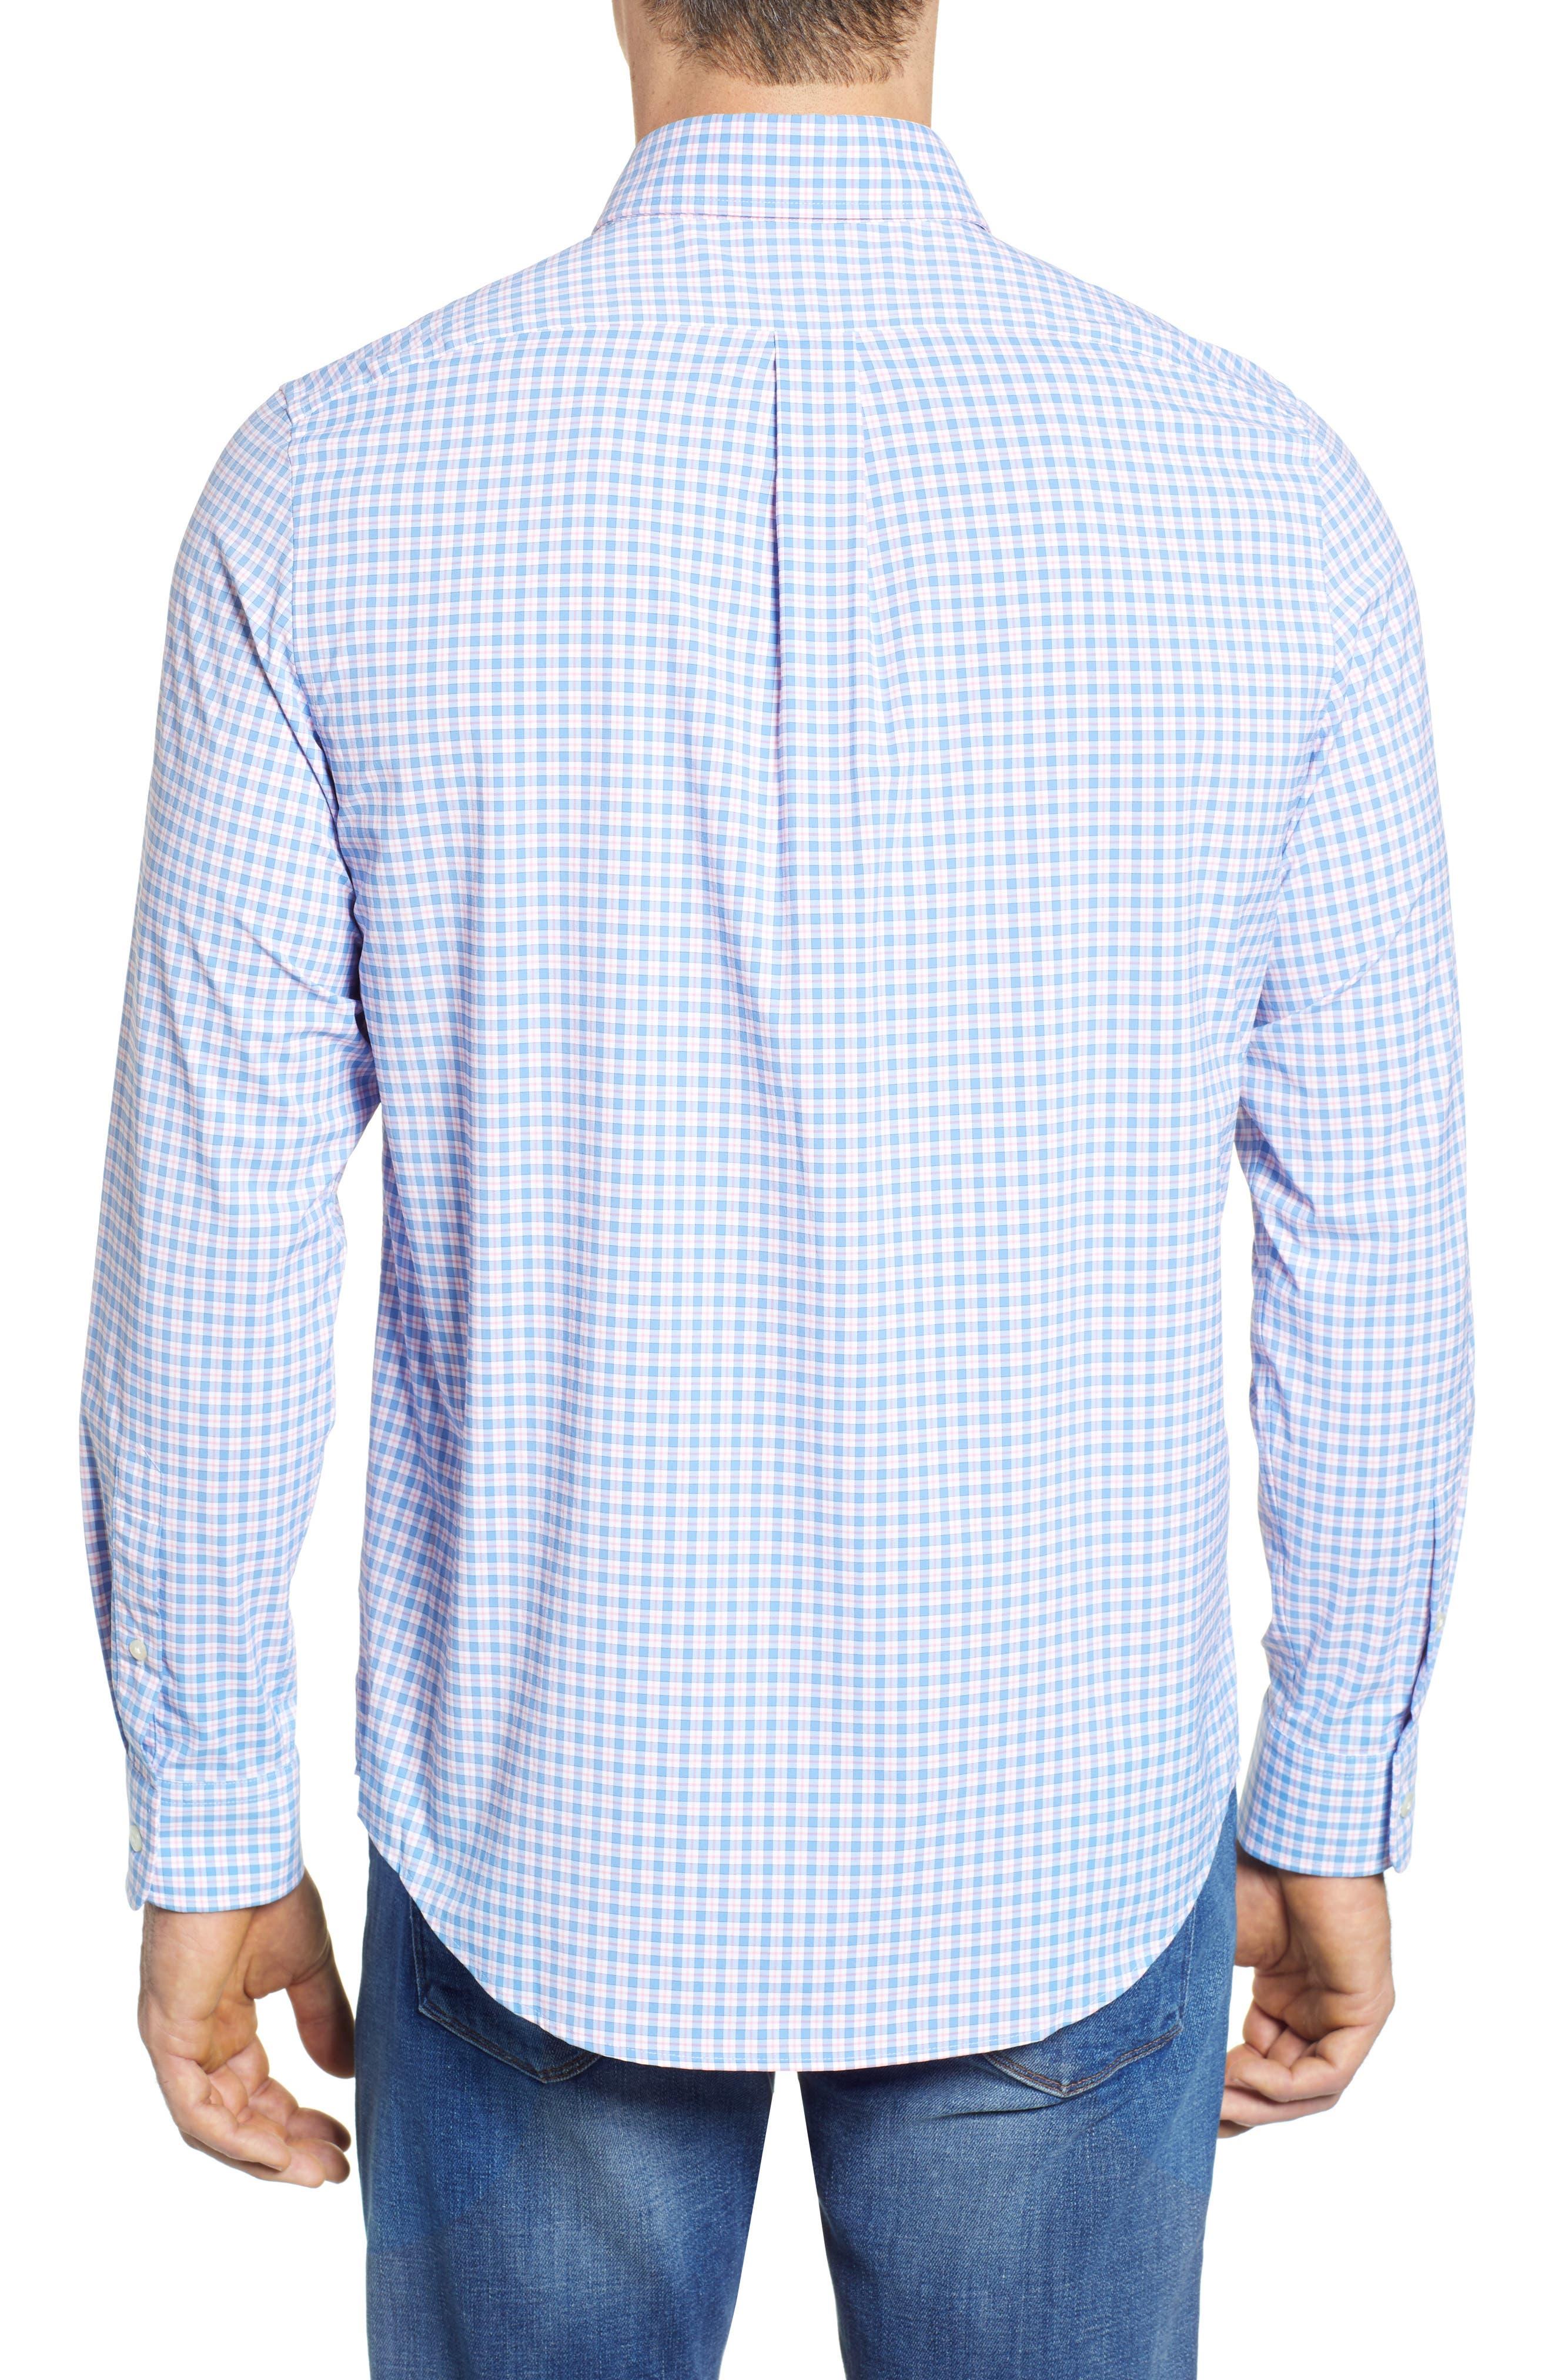 Oyster Pond Slim Fit Plaid Sport Shirt,                             Alternate thumbnail 2, color,                             OCEAN BREEZE